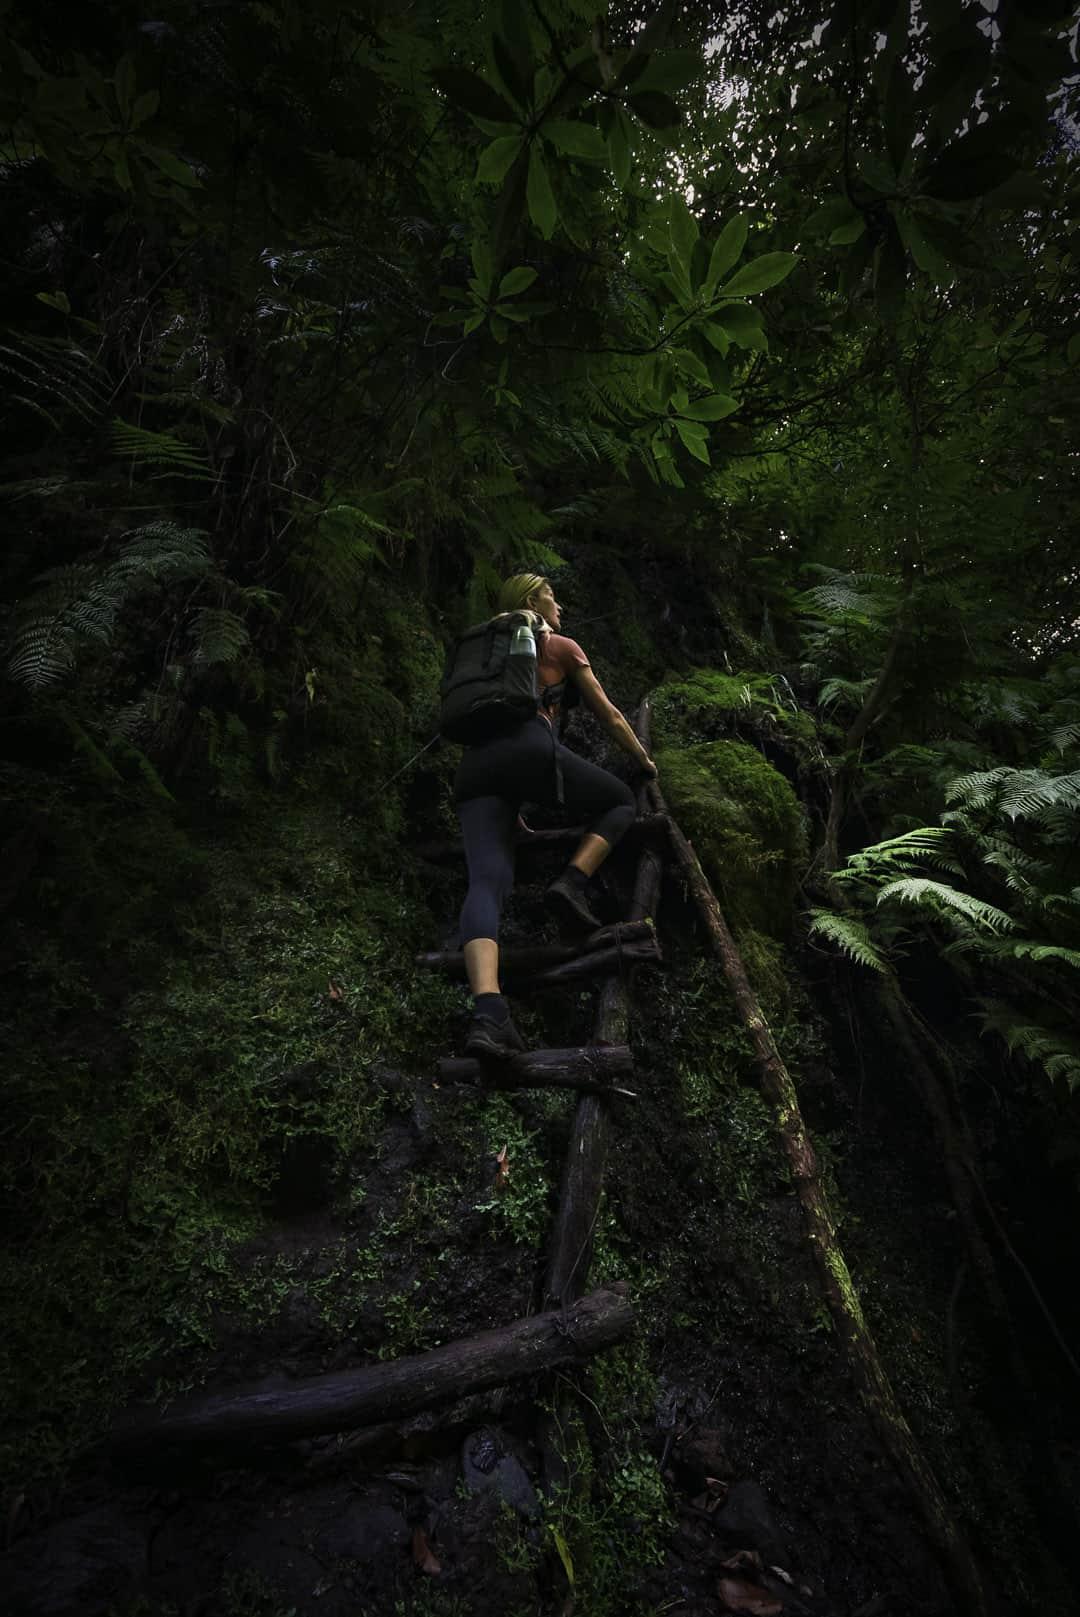 Poco-das-pulgas-stair-climbing